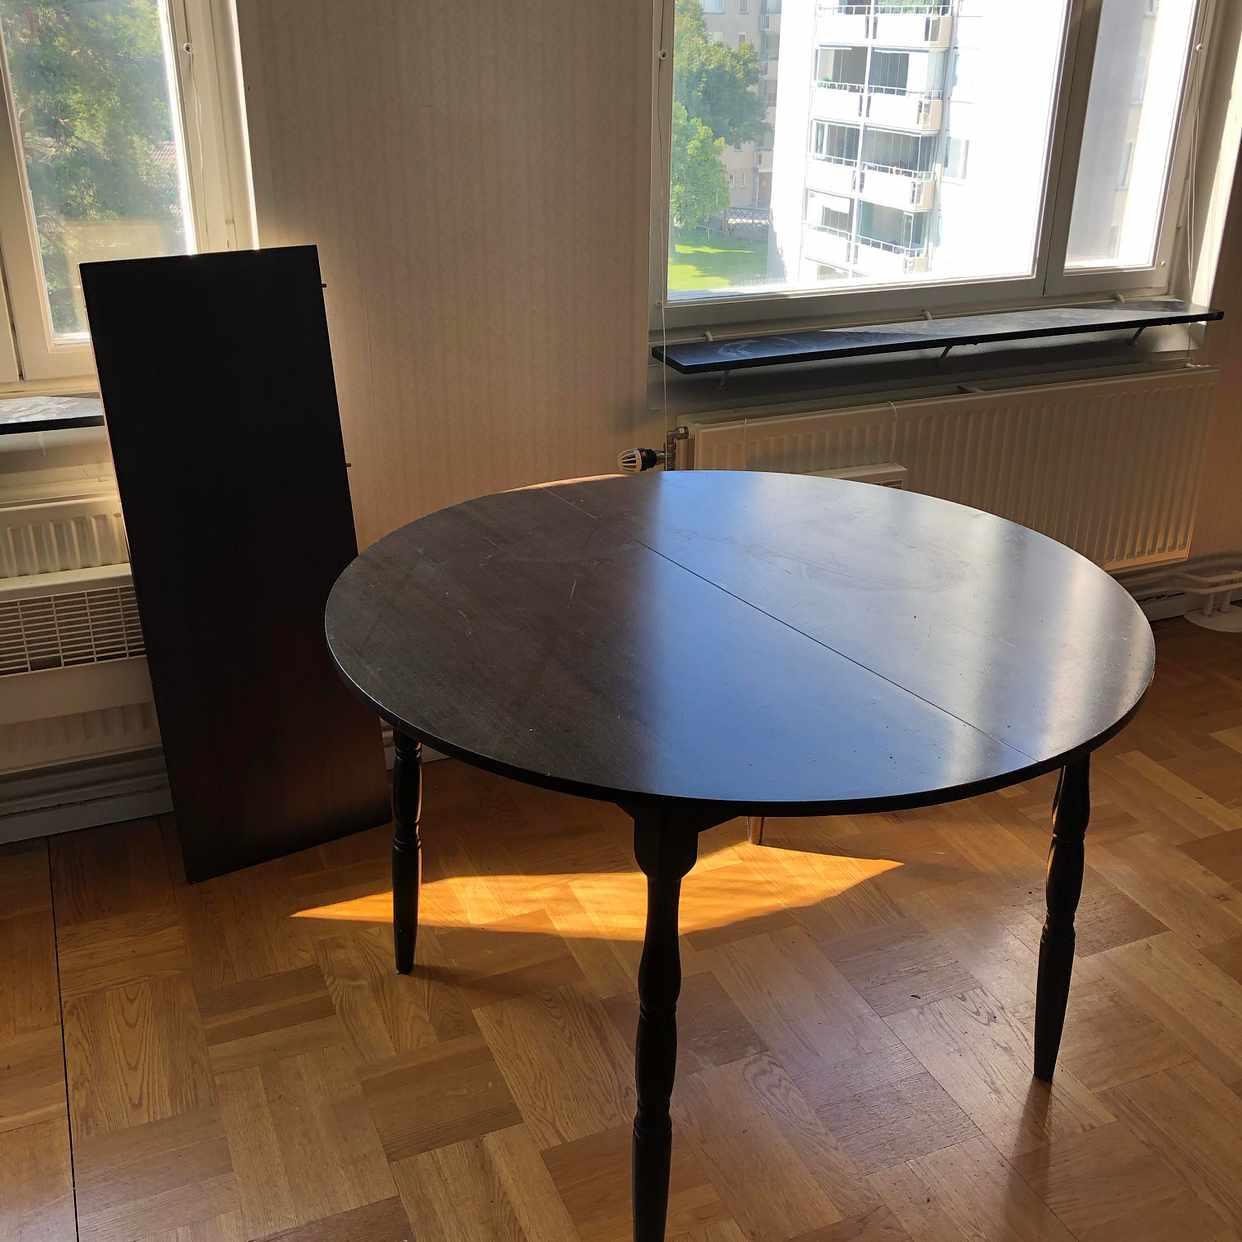 image of Brunt köksbord med utdrag - Stockholm